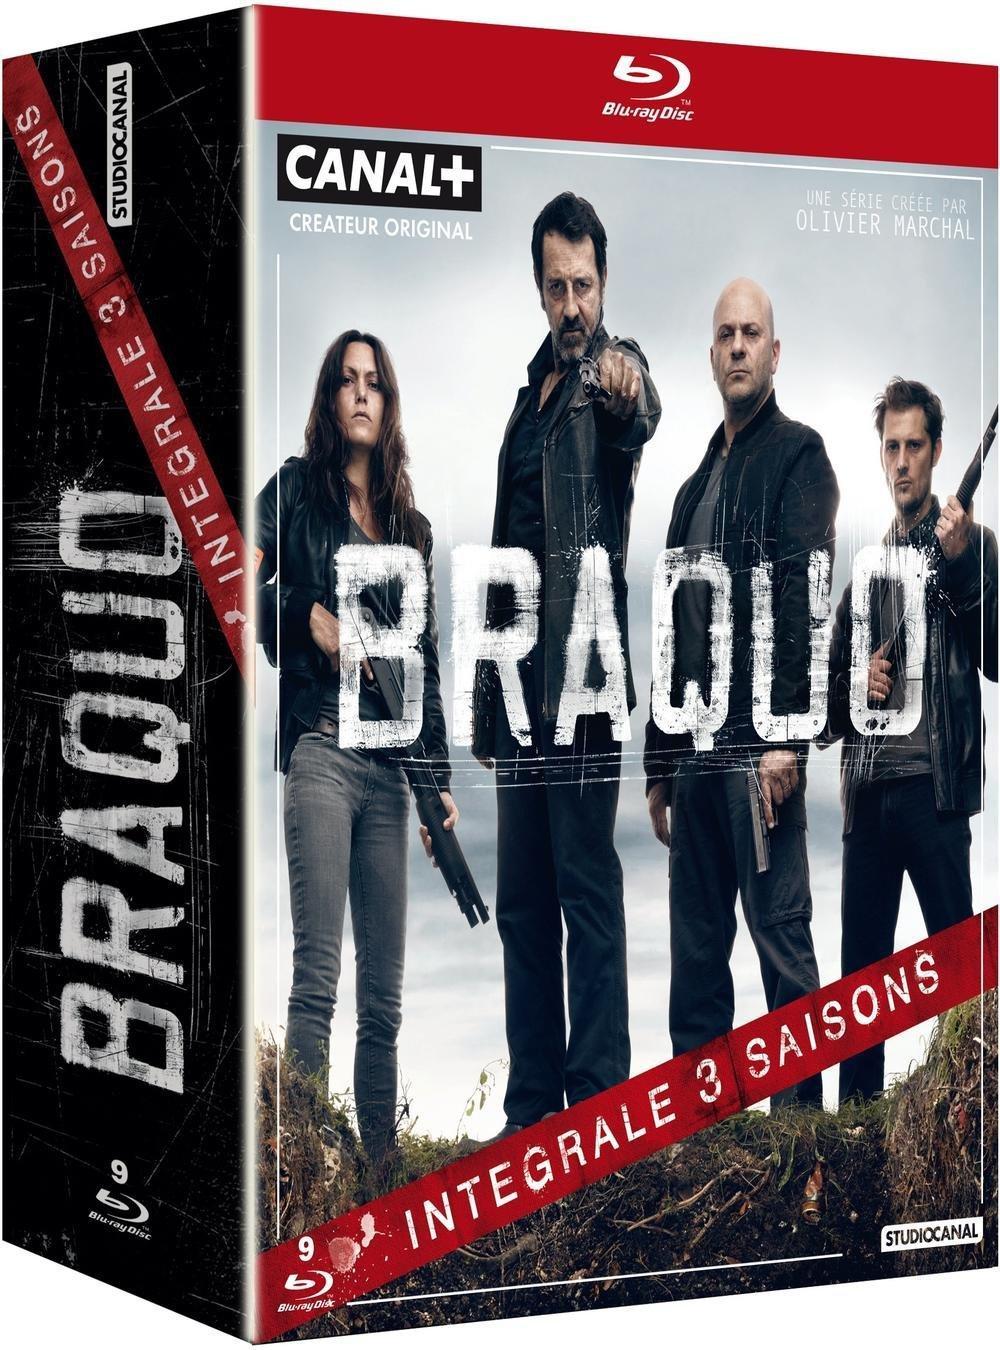 Coffret Blu-ray : Braquo - Intégrale 3 saisons